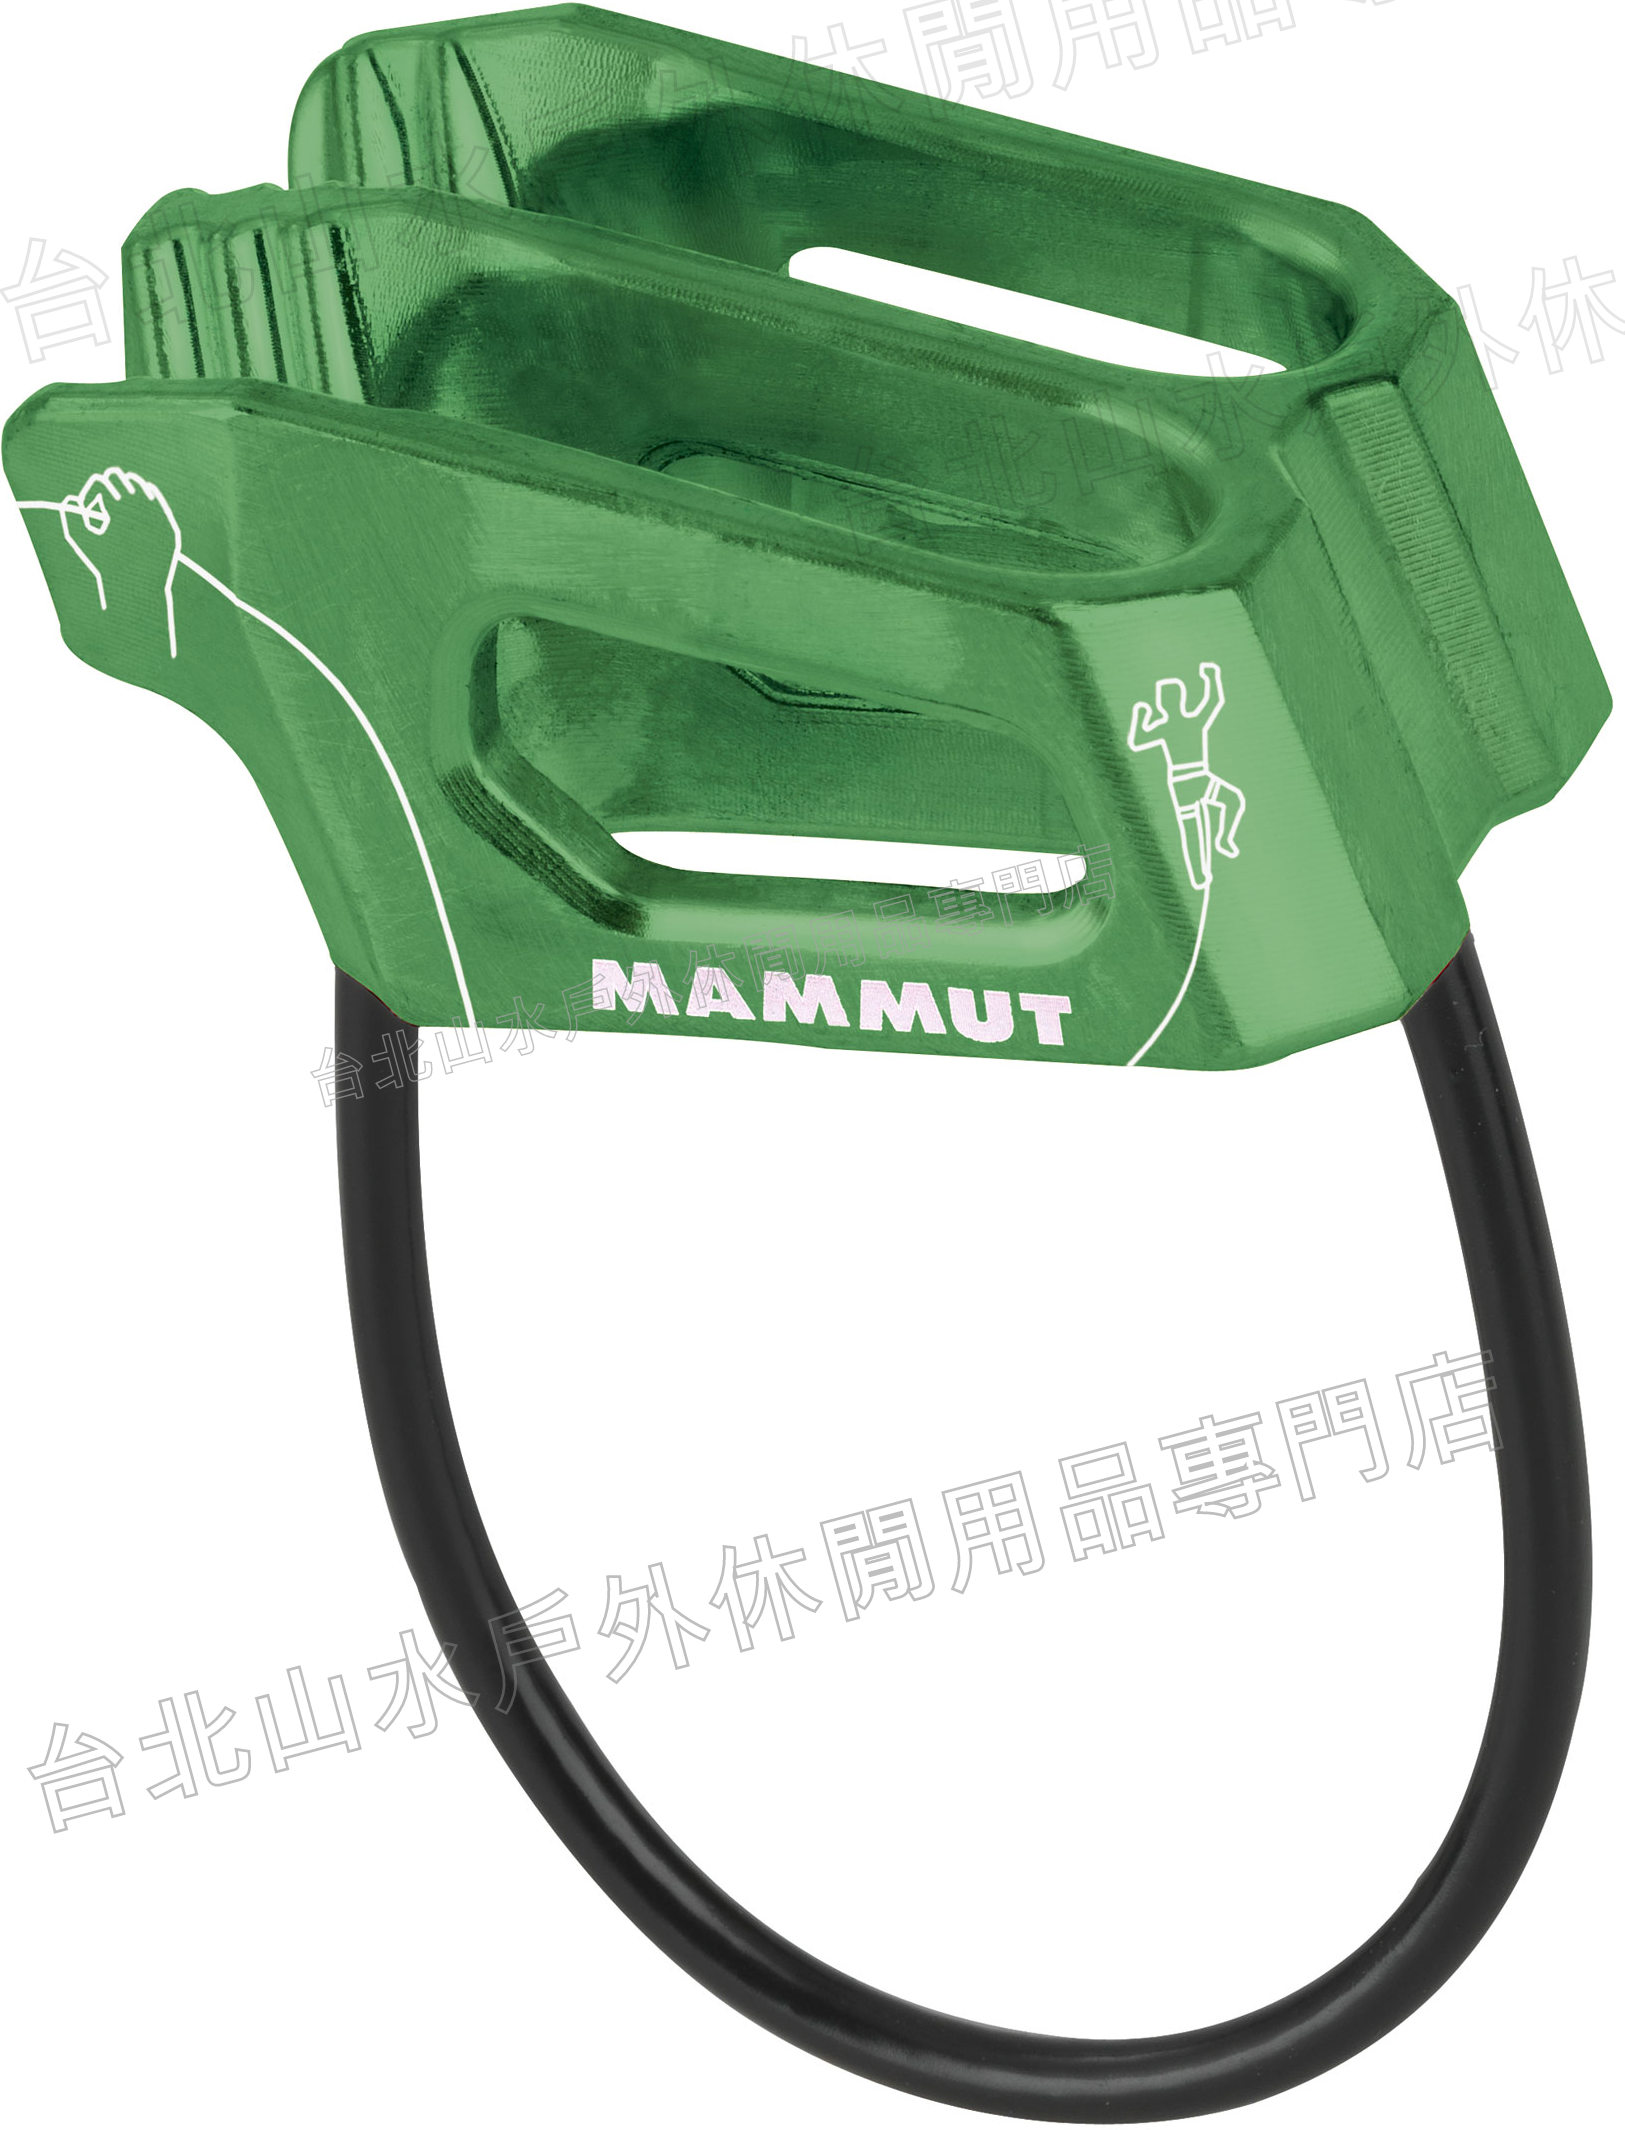 [ Mammut 長毛象 ] 確保器/豬鼻子/制動器 Crag Light Belay 2210-01101 綠